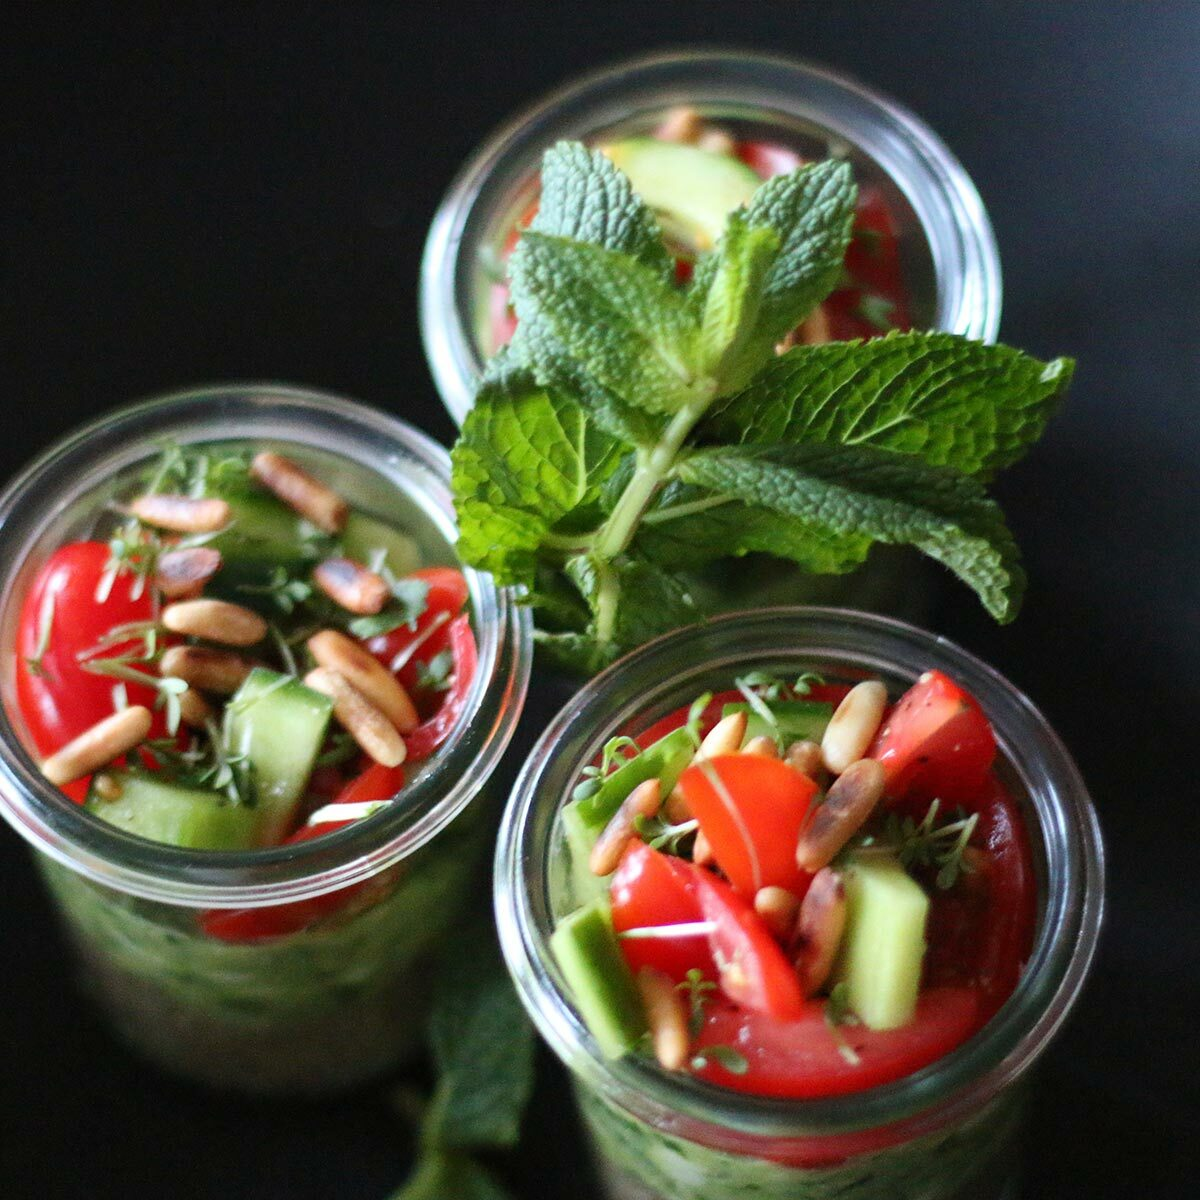 Hühnchen, Guacamole, Quinoa – Dreierlei im Glas